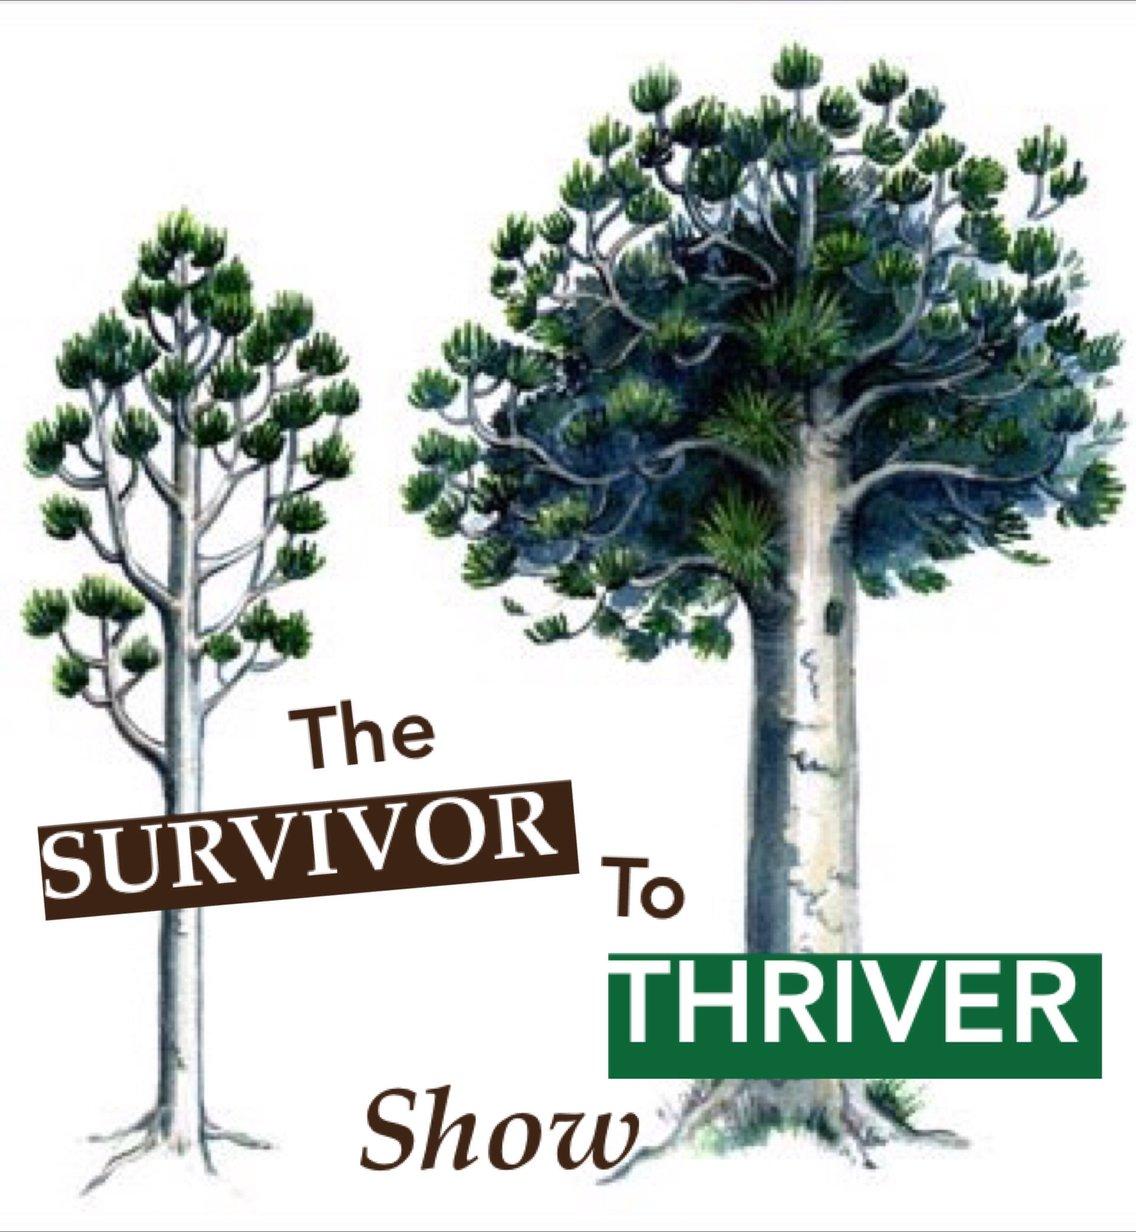 The Survivor to Thriver Show - Cover Image